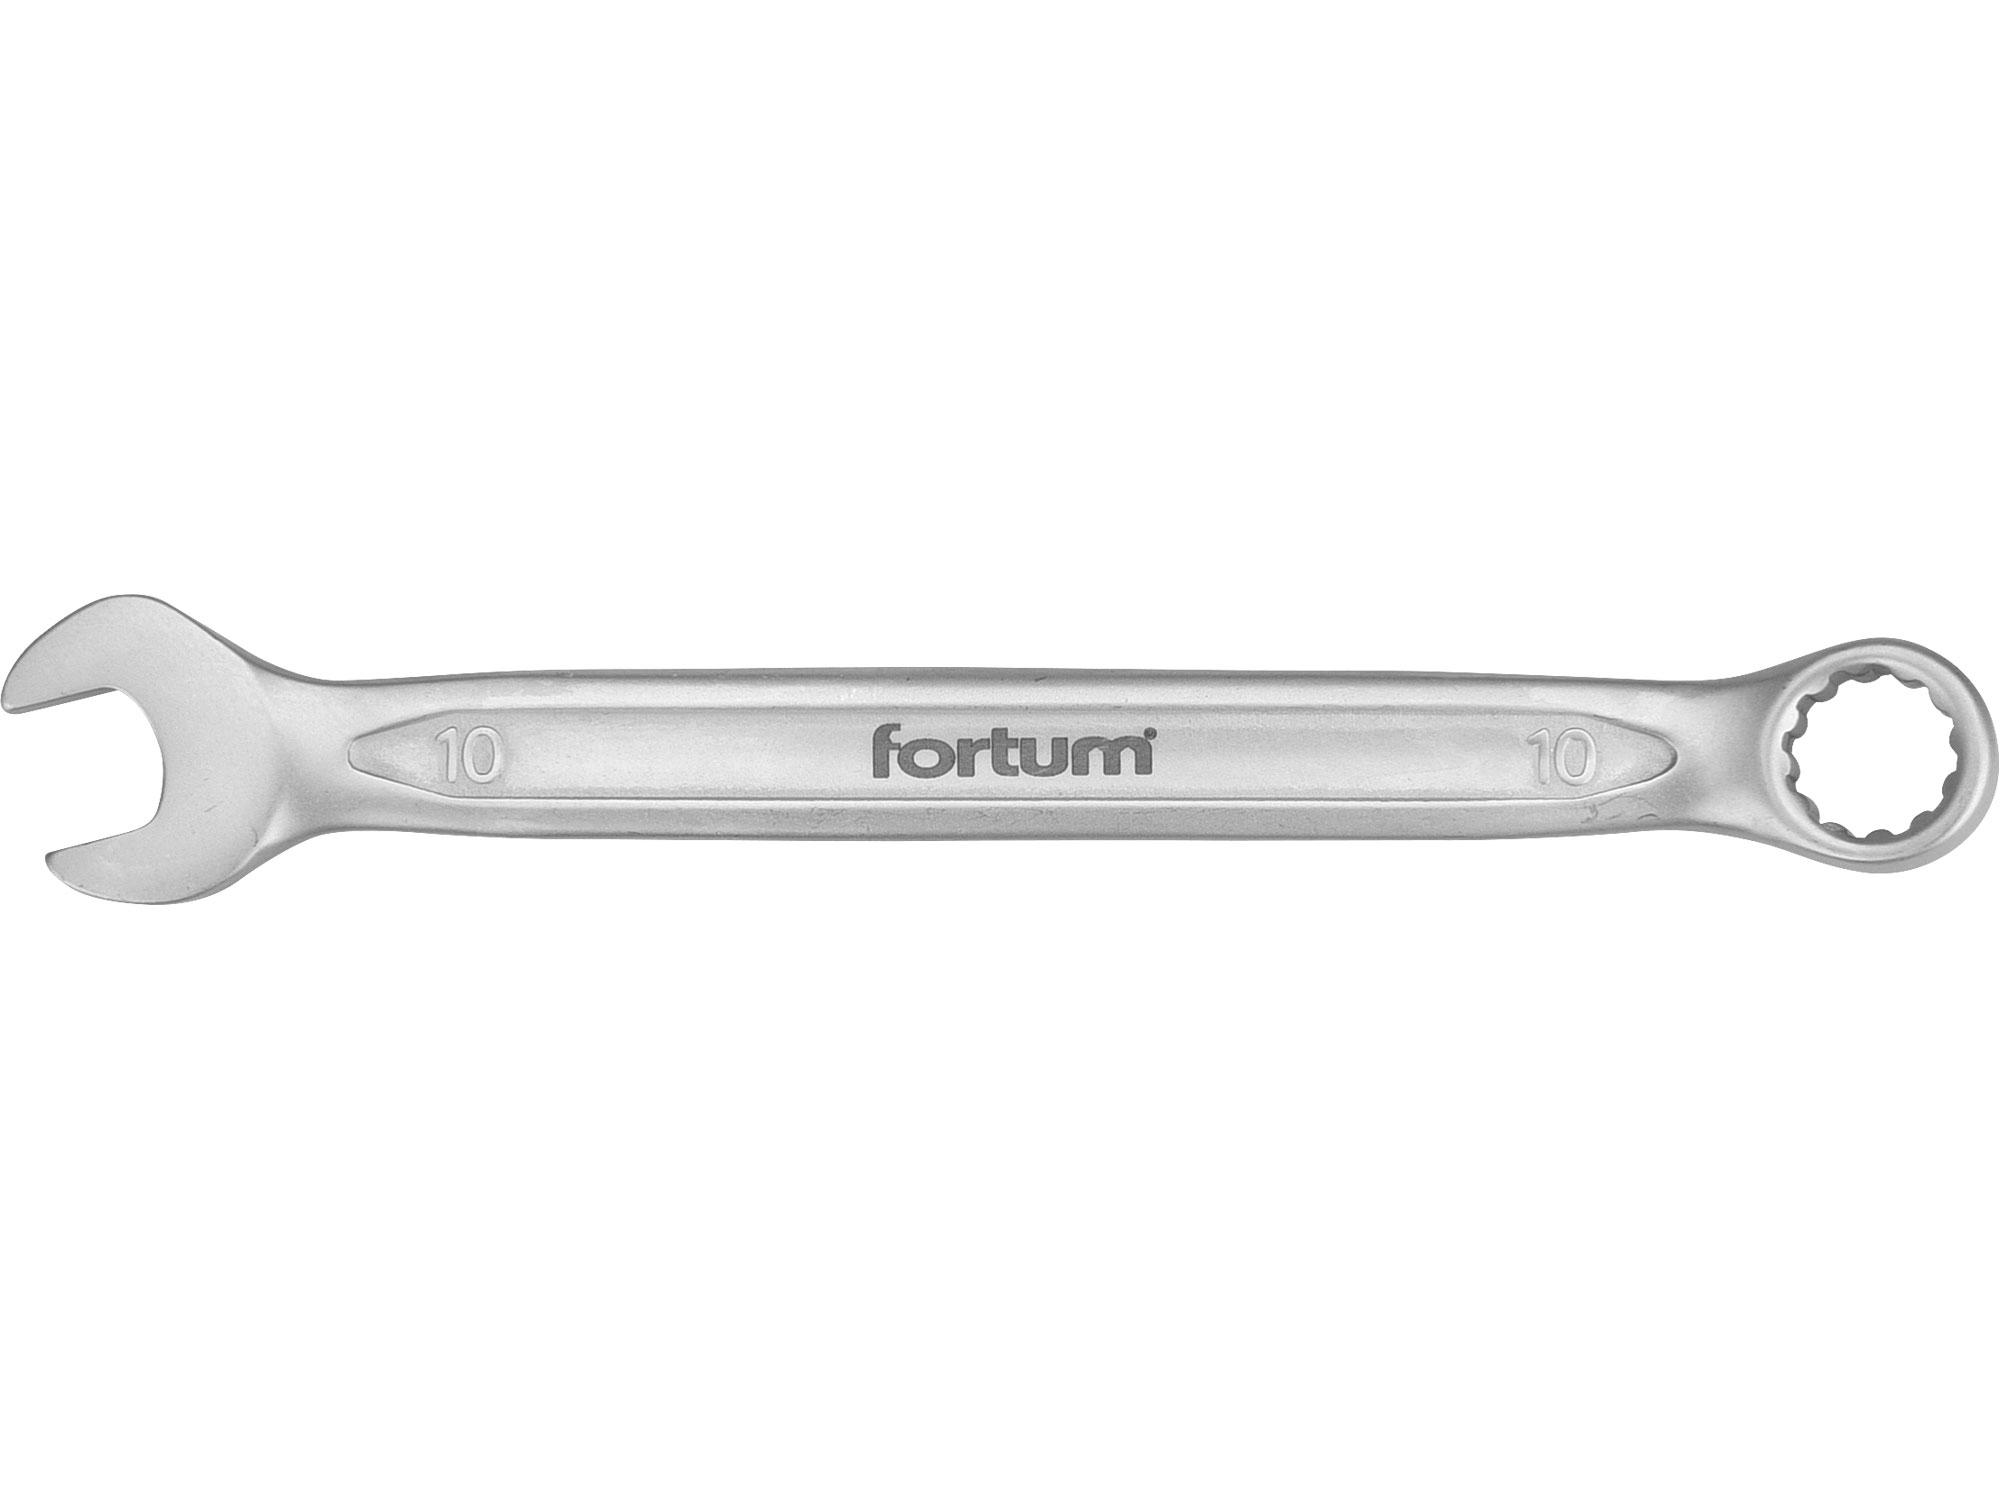 klíč očkoplochý, 10mm, L 150mm, FORTUM 4730210